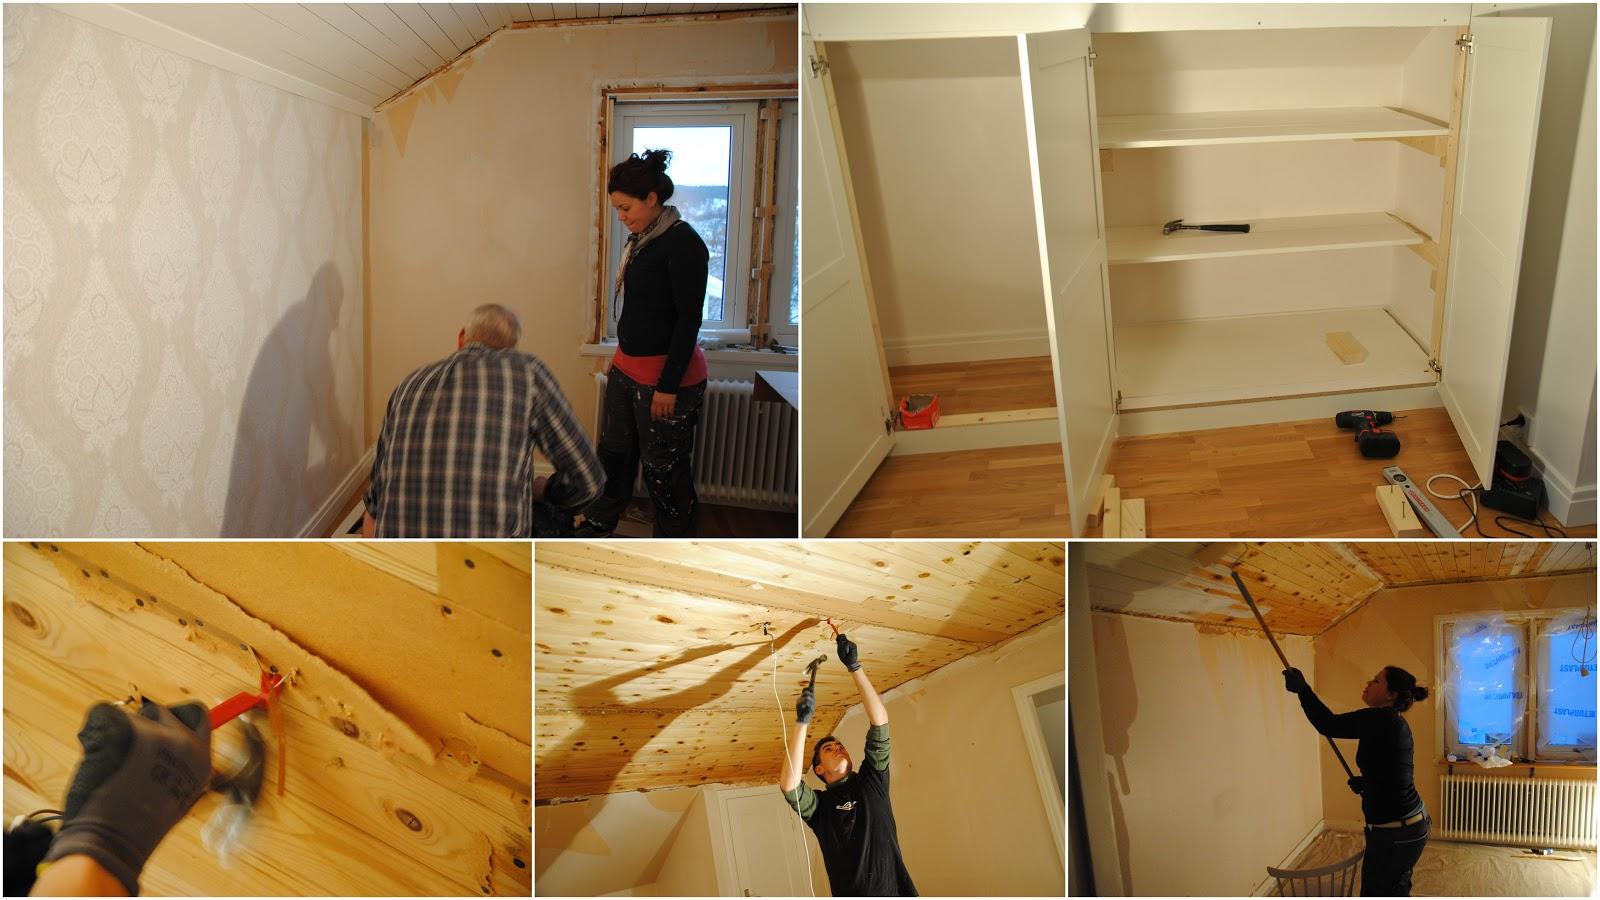 VÃ¥rat lilla hus: januari 2012